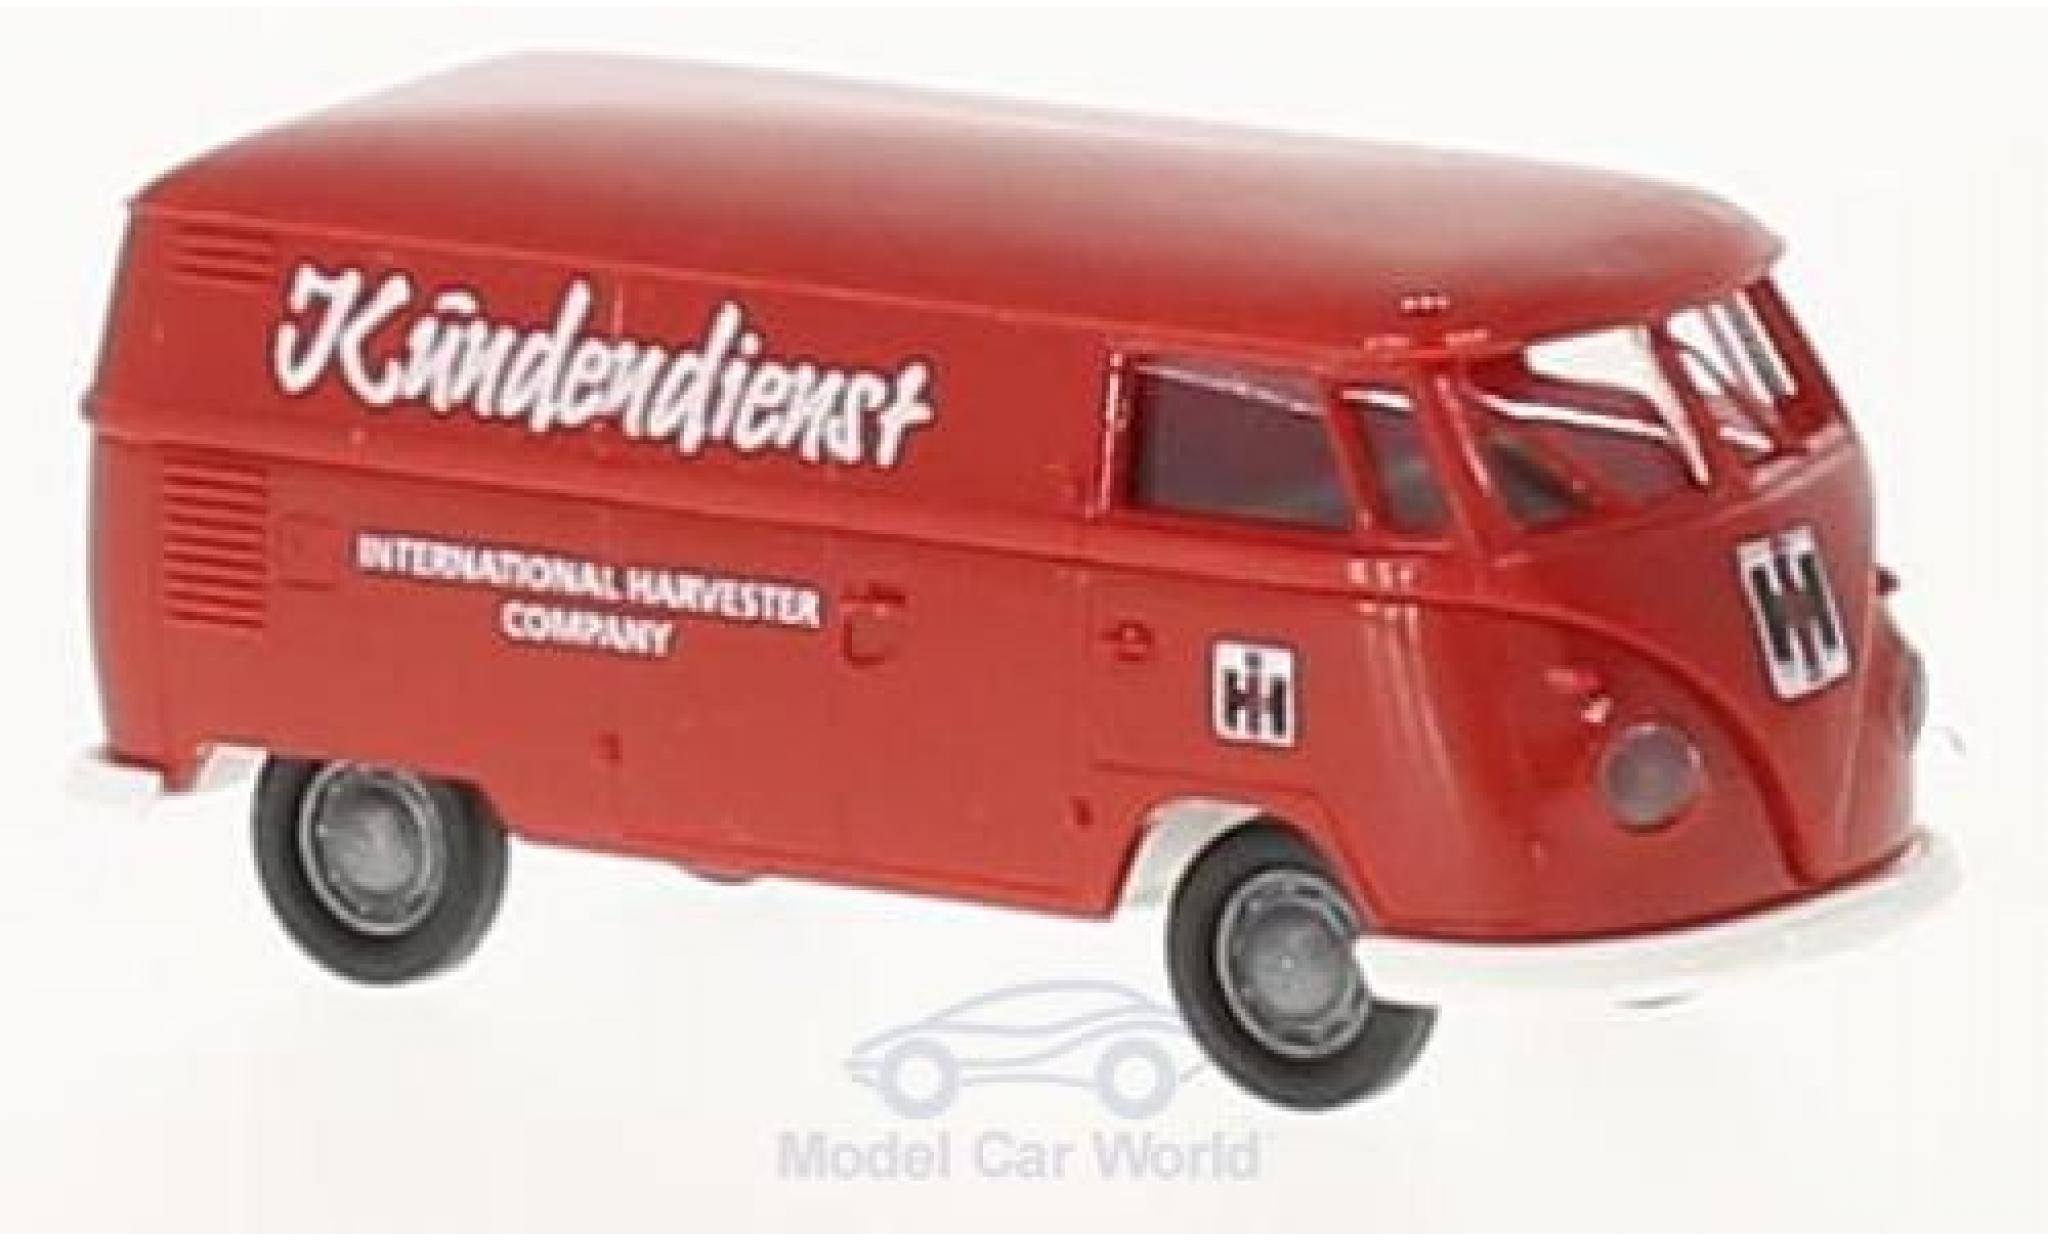 Volkswagen T1 B 1/87 Brekina b Kasten Kundendienst International Harvester